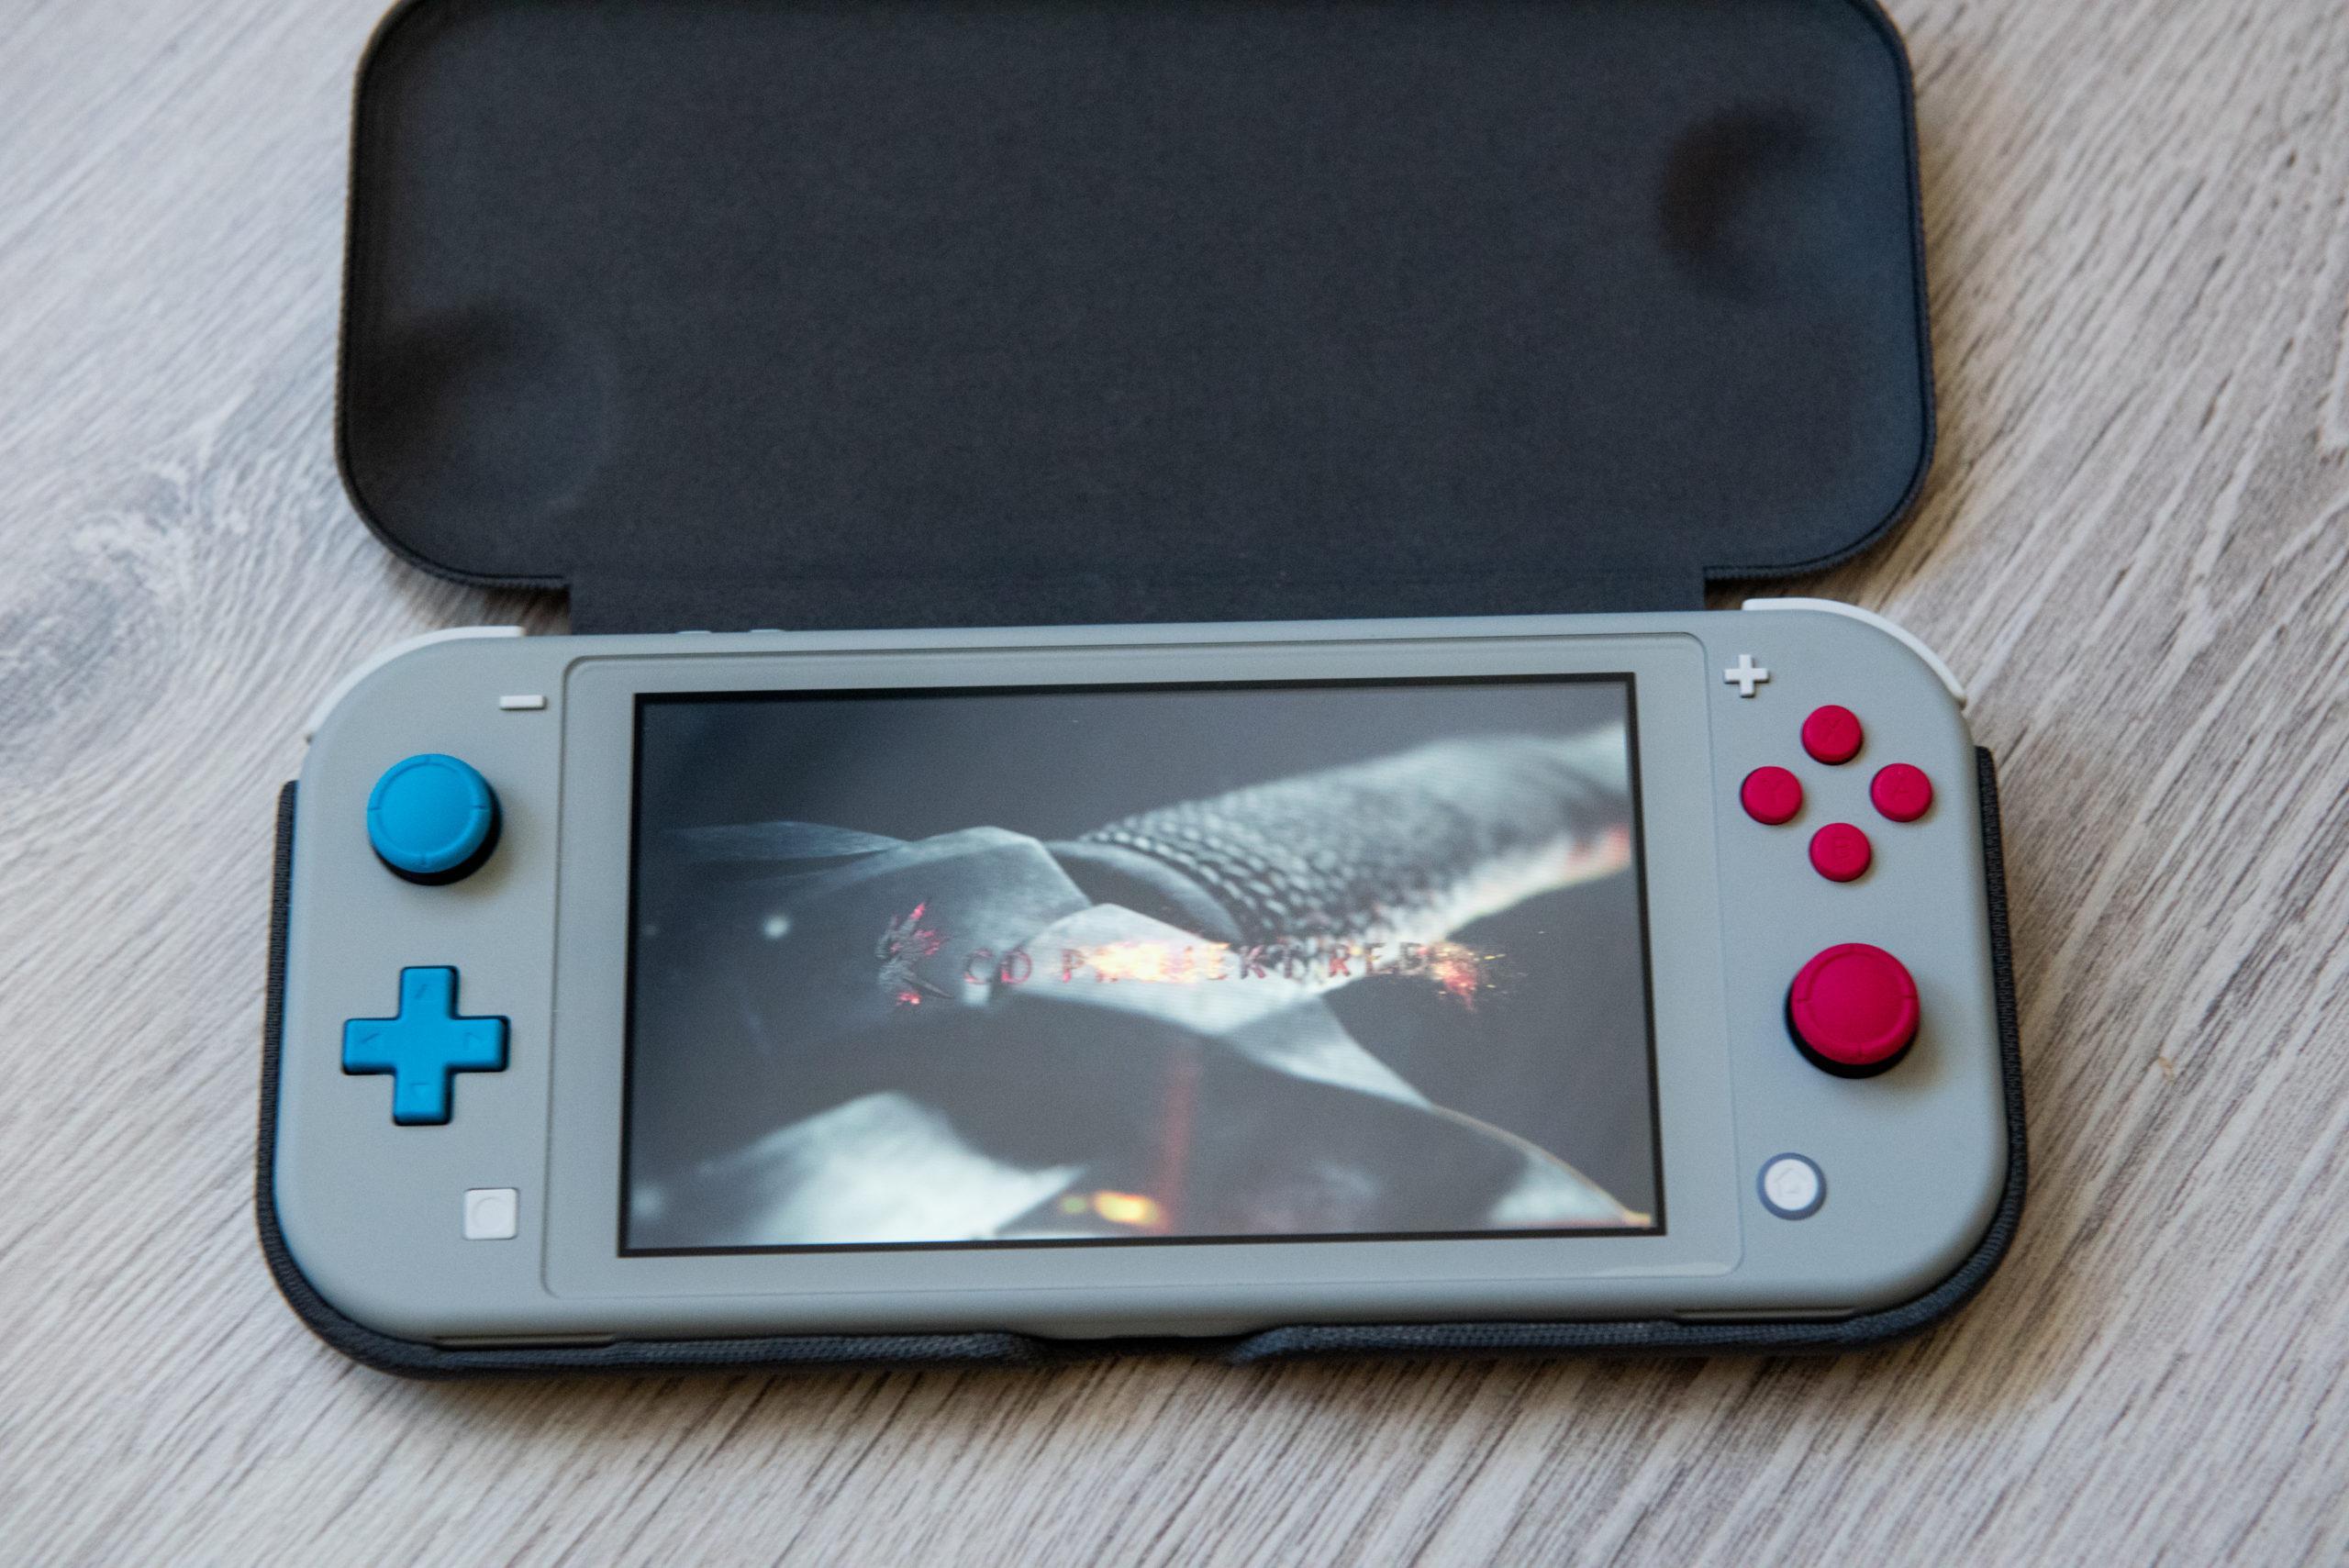 Обзор Nintendo Switch Lite - Жизнь после гибрида 12